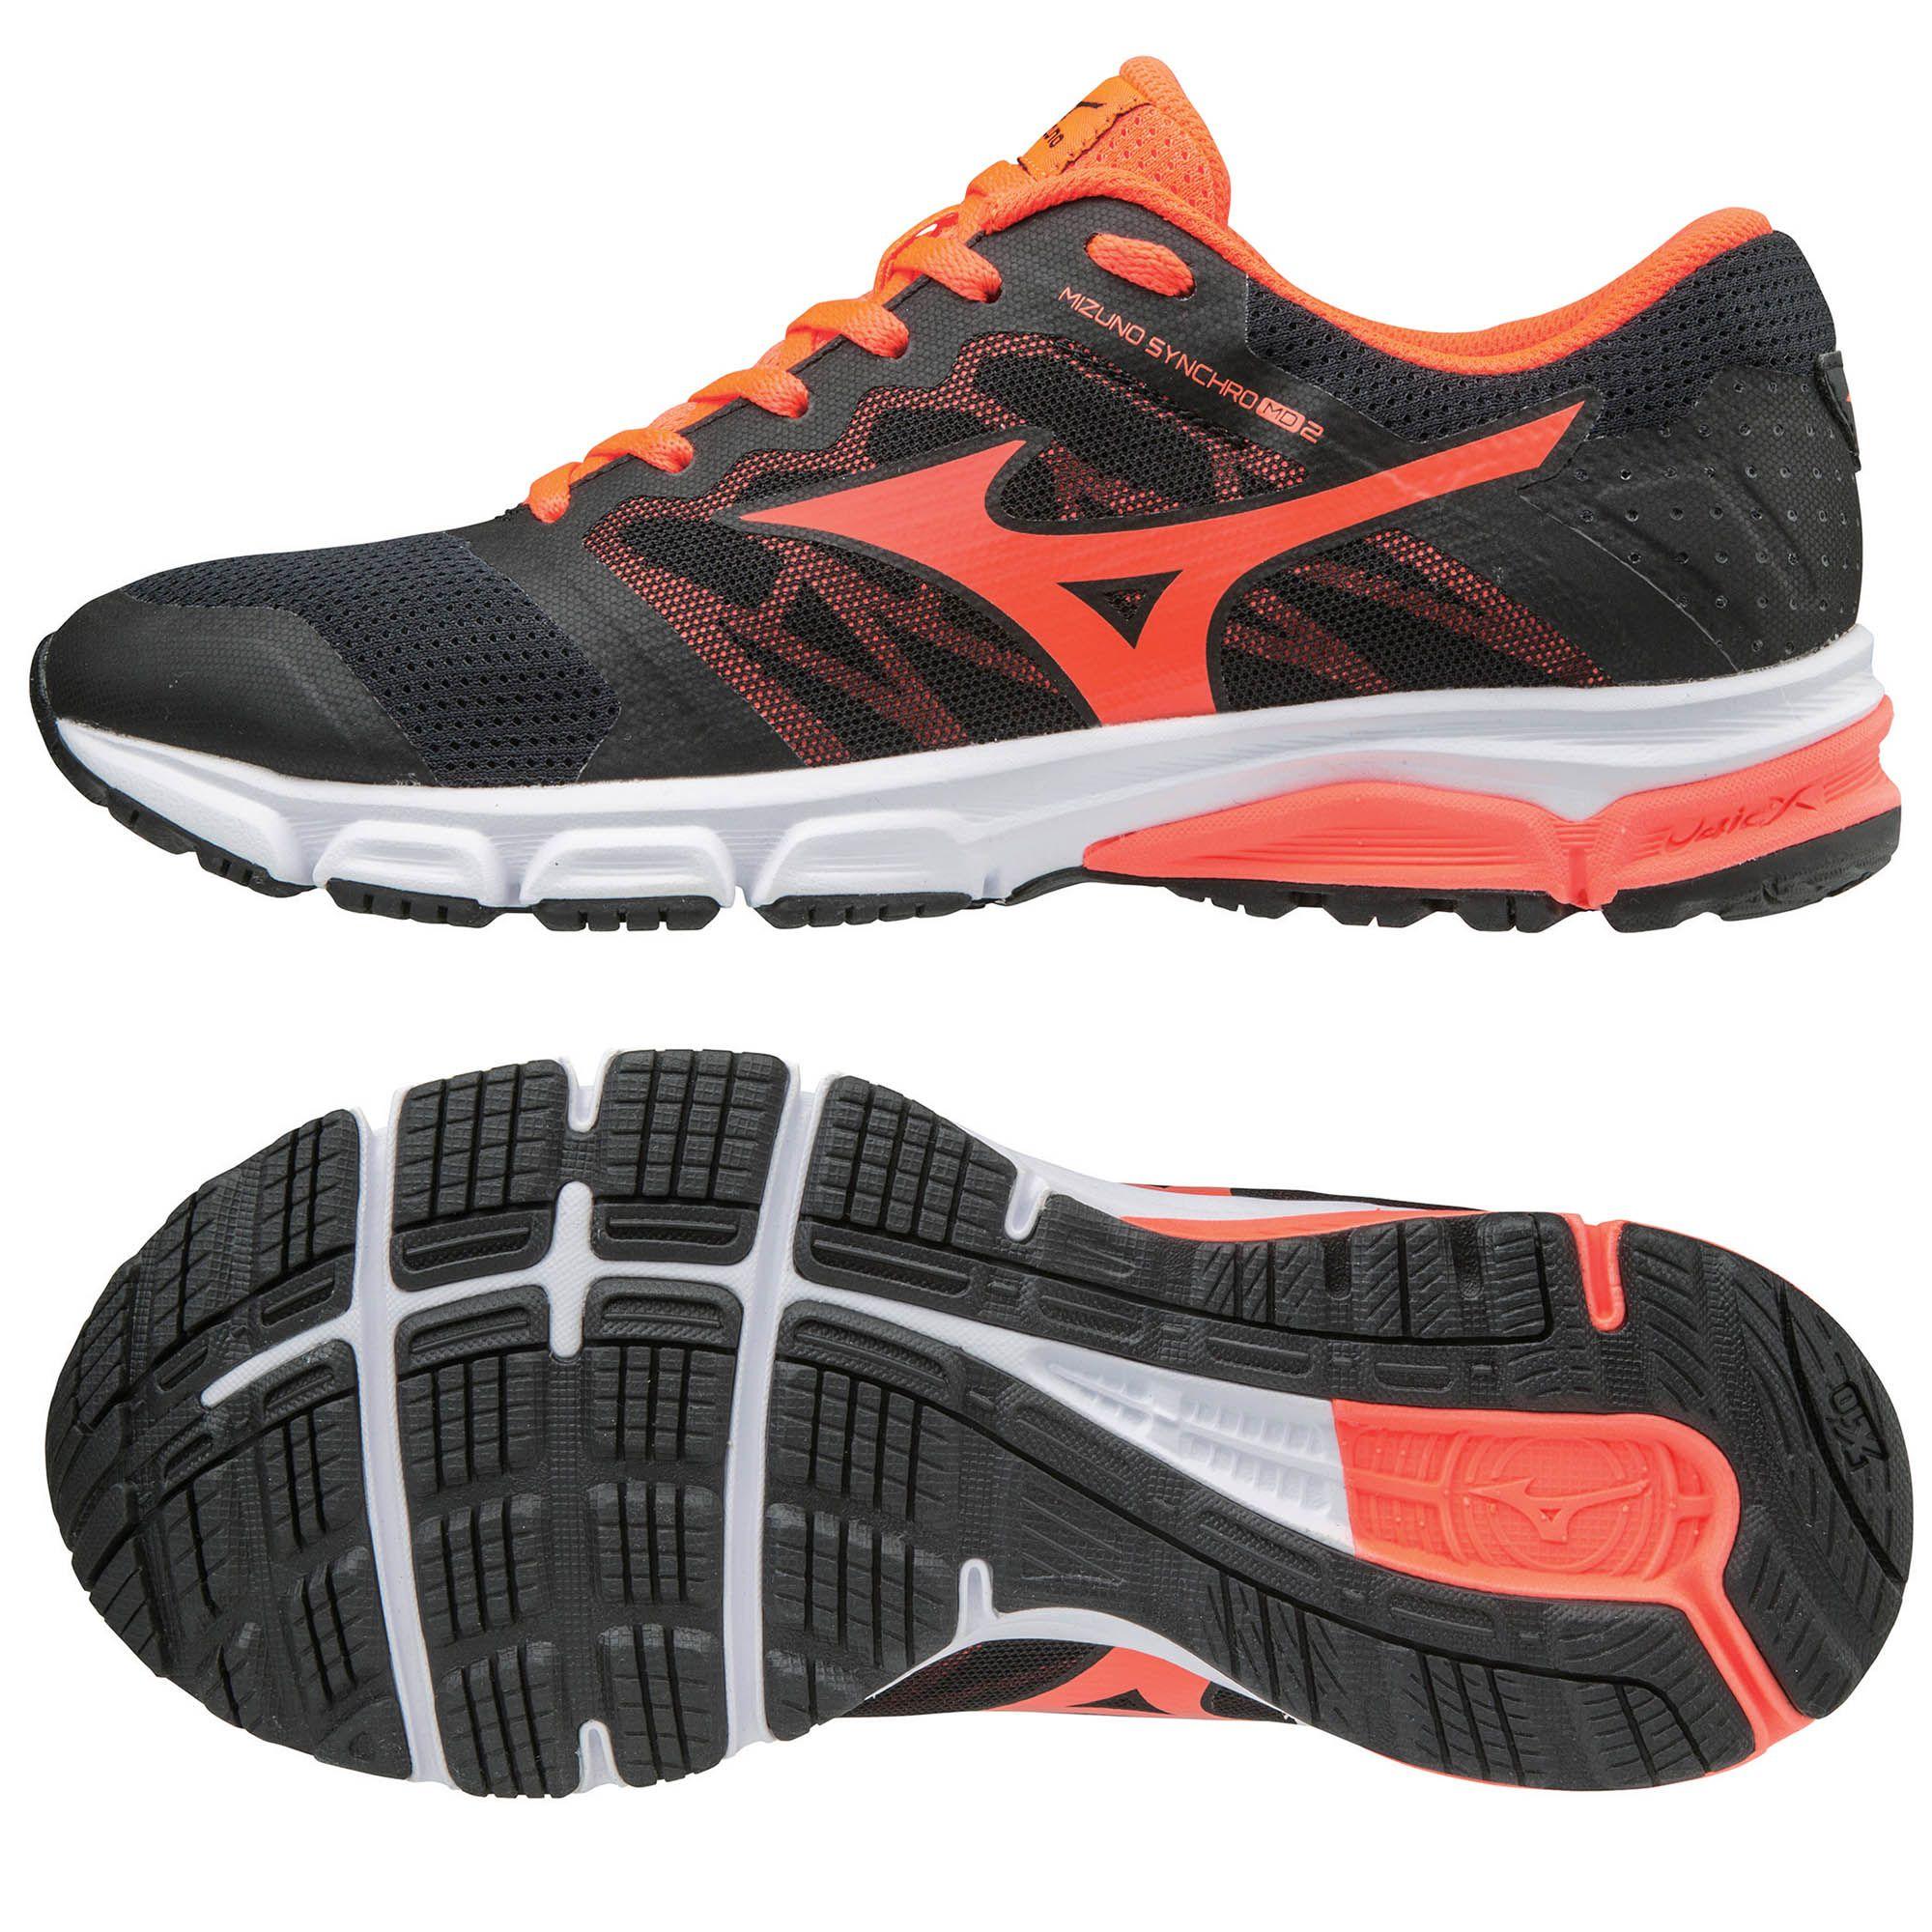 Nike Shoe Outlet Maryland